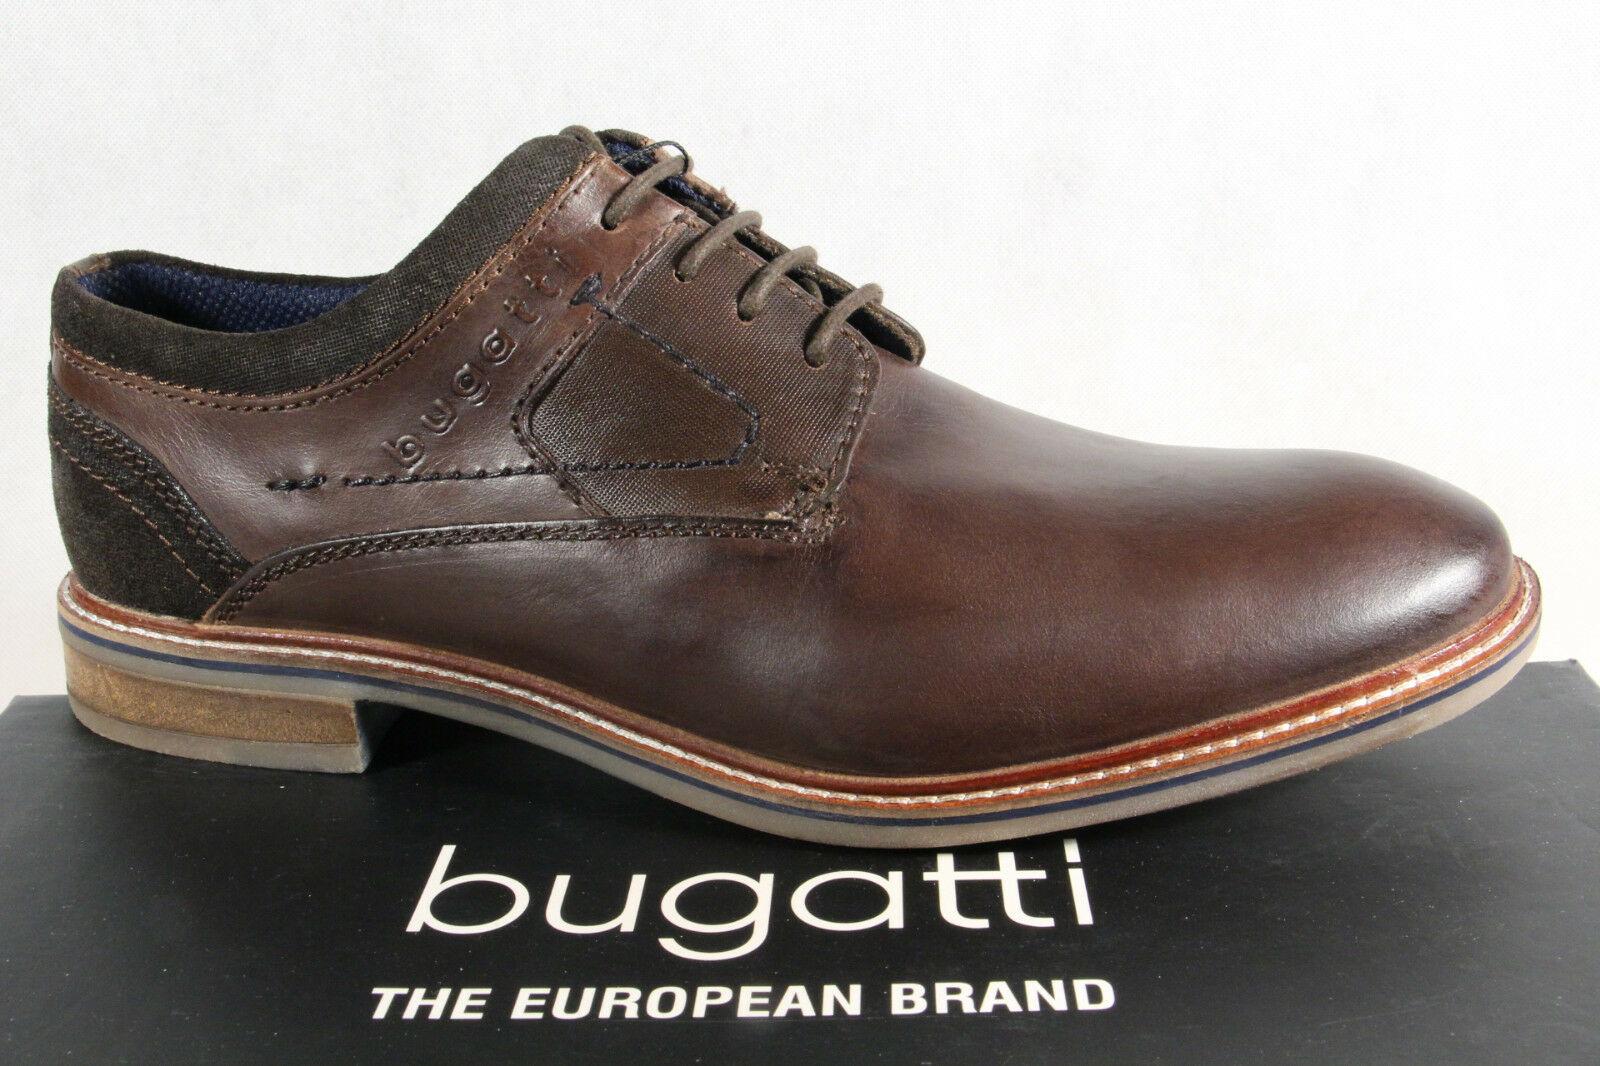 Bugatti Herren Schnürschuh, Halbschuh Sneaker dunkelbraun, 311 Usedlook NEU!!